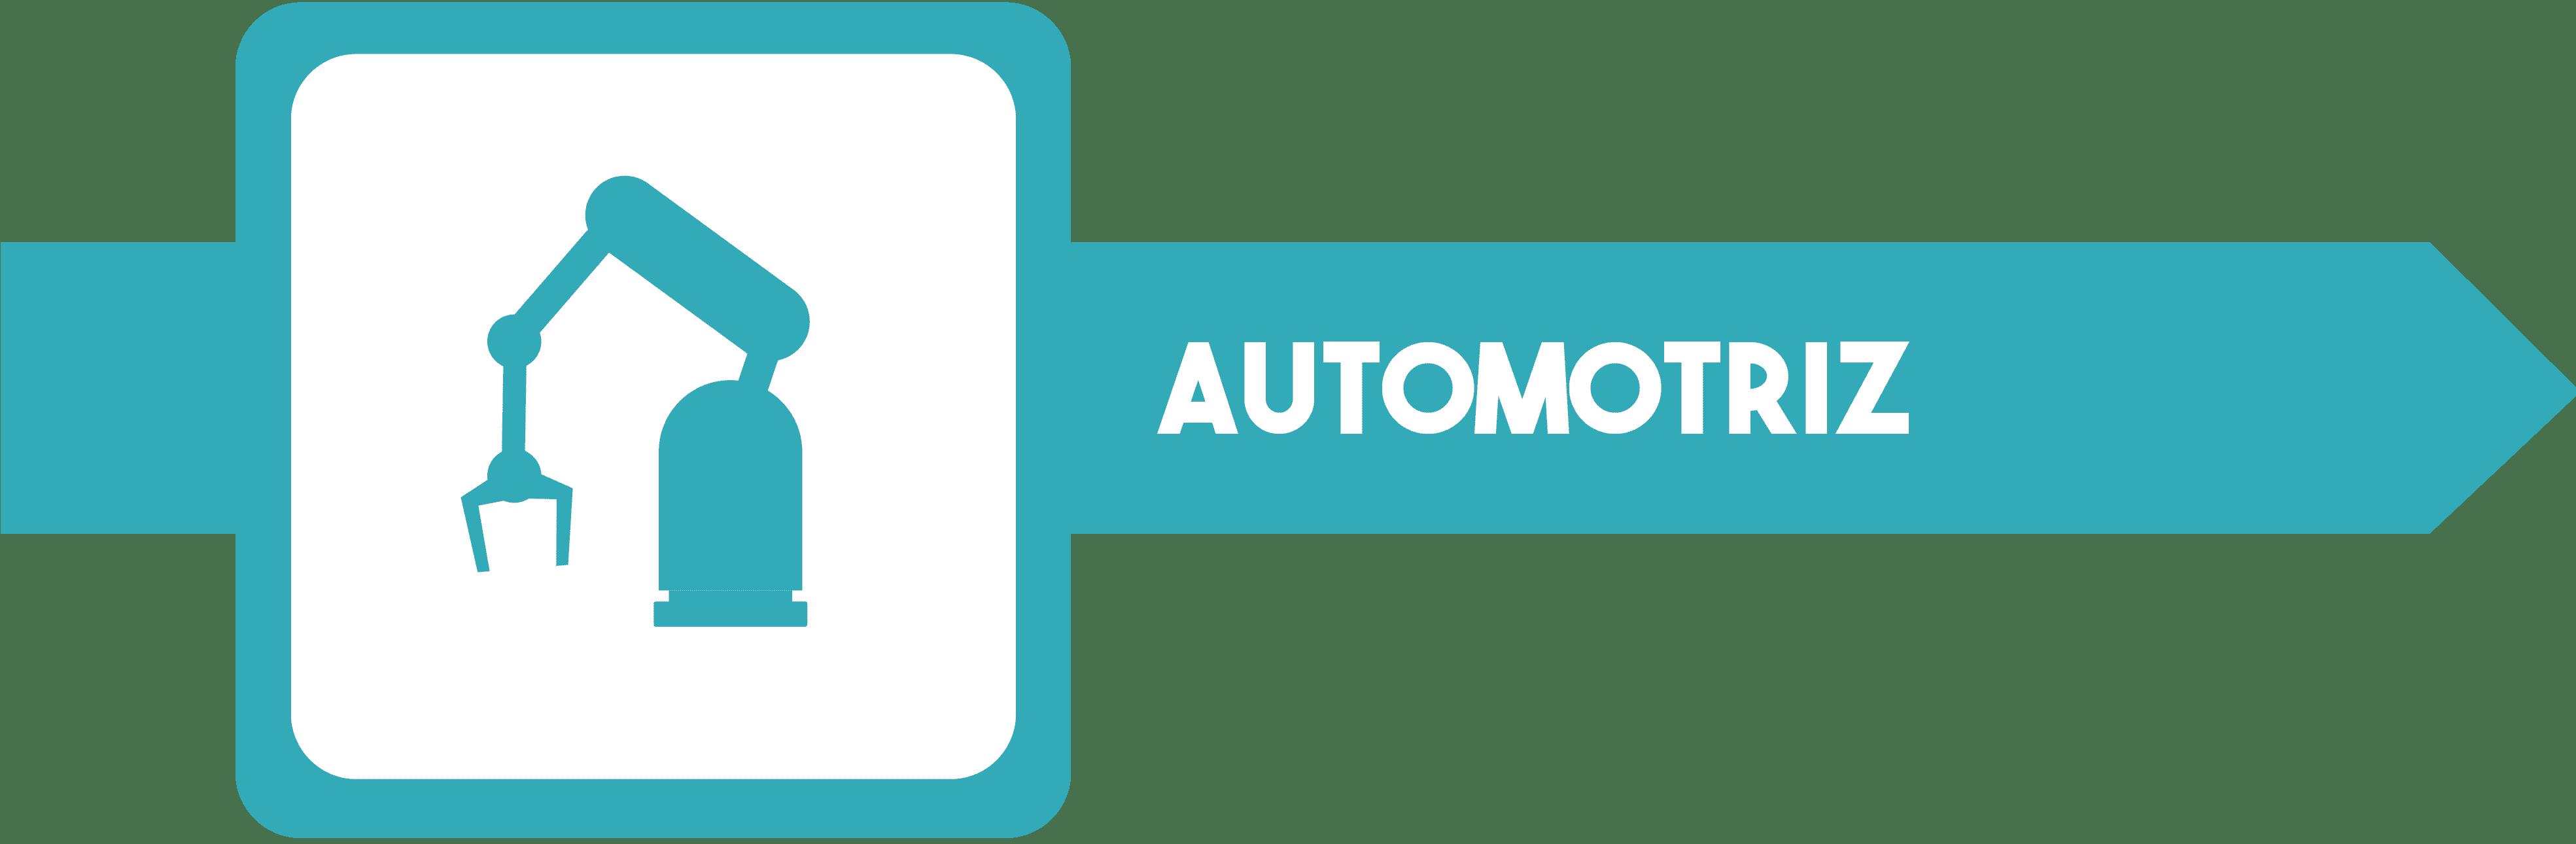 Automotriz